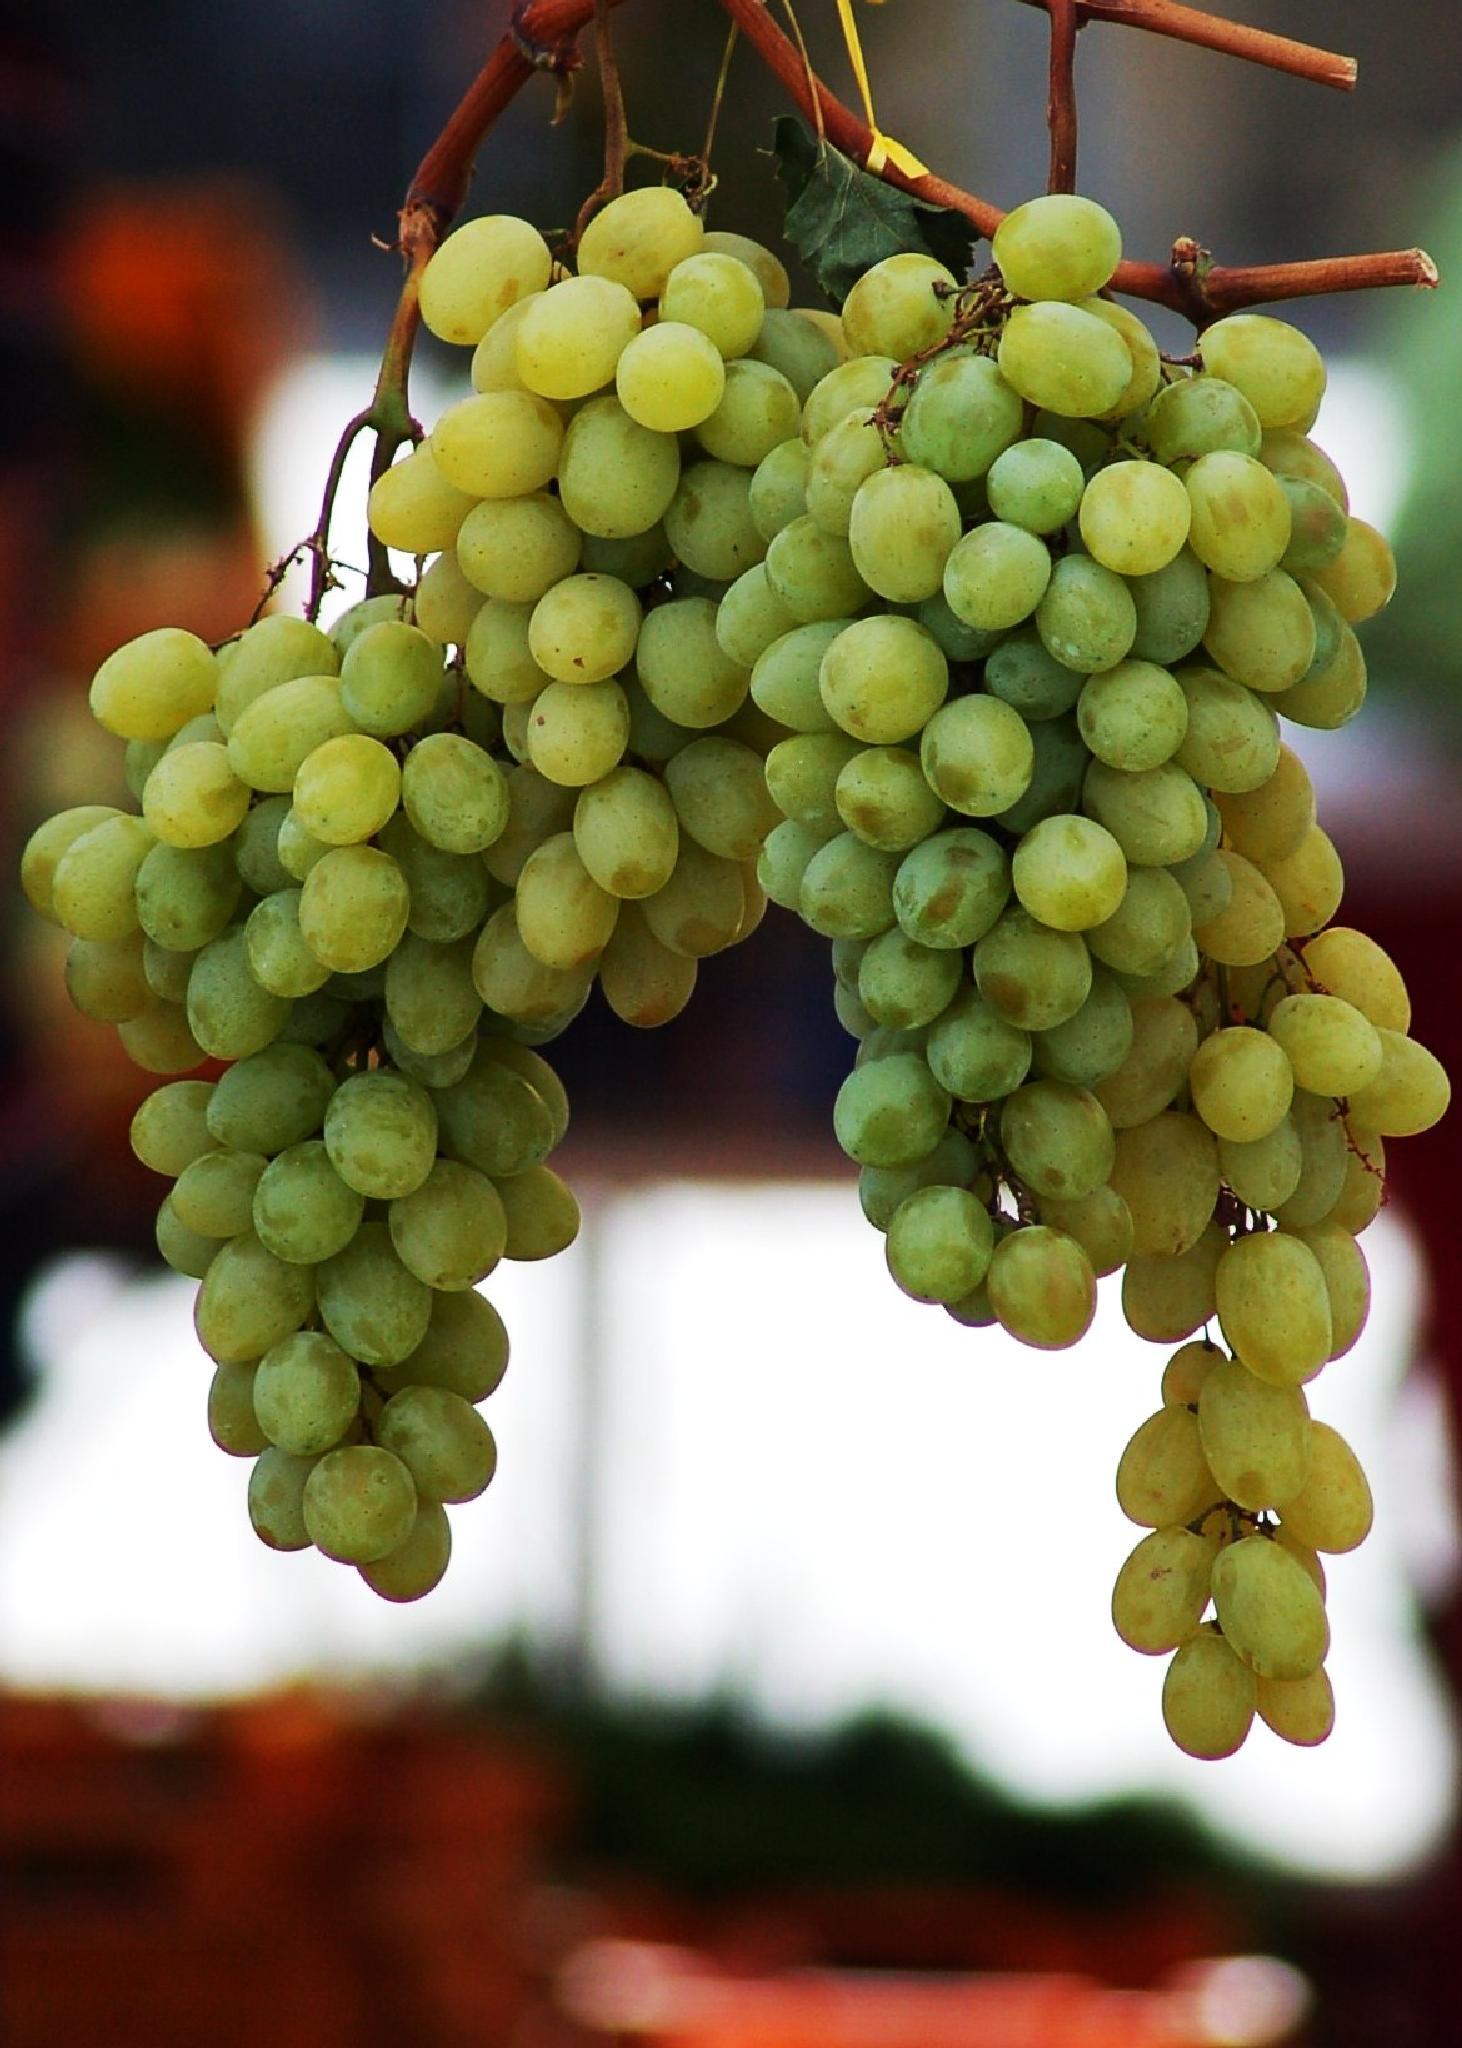 Grapes by Steve Webb